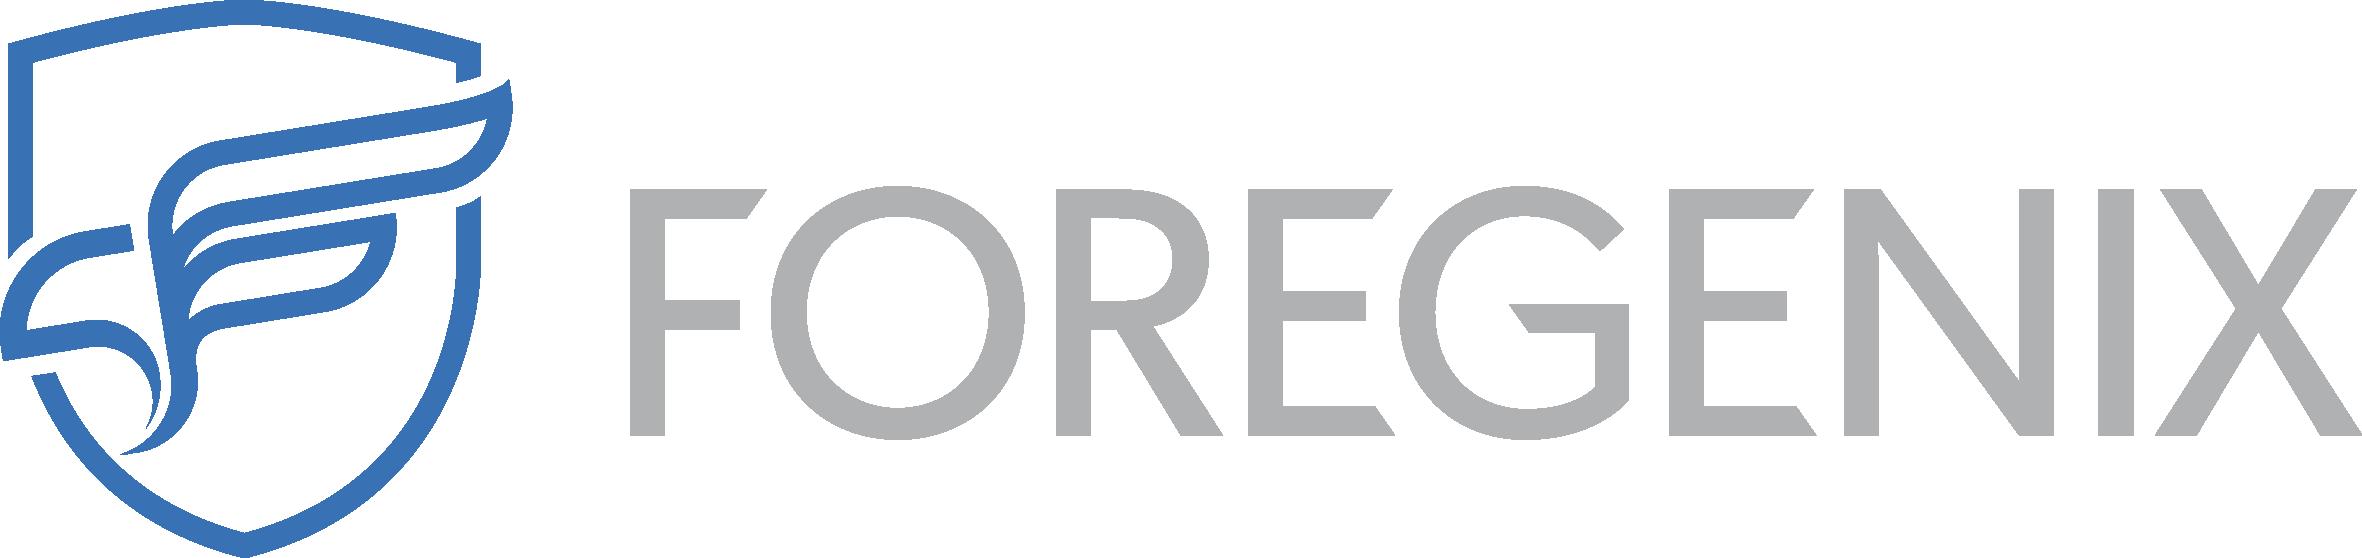 Foregenix-Logo-Horizontal-Colour